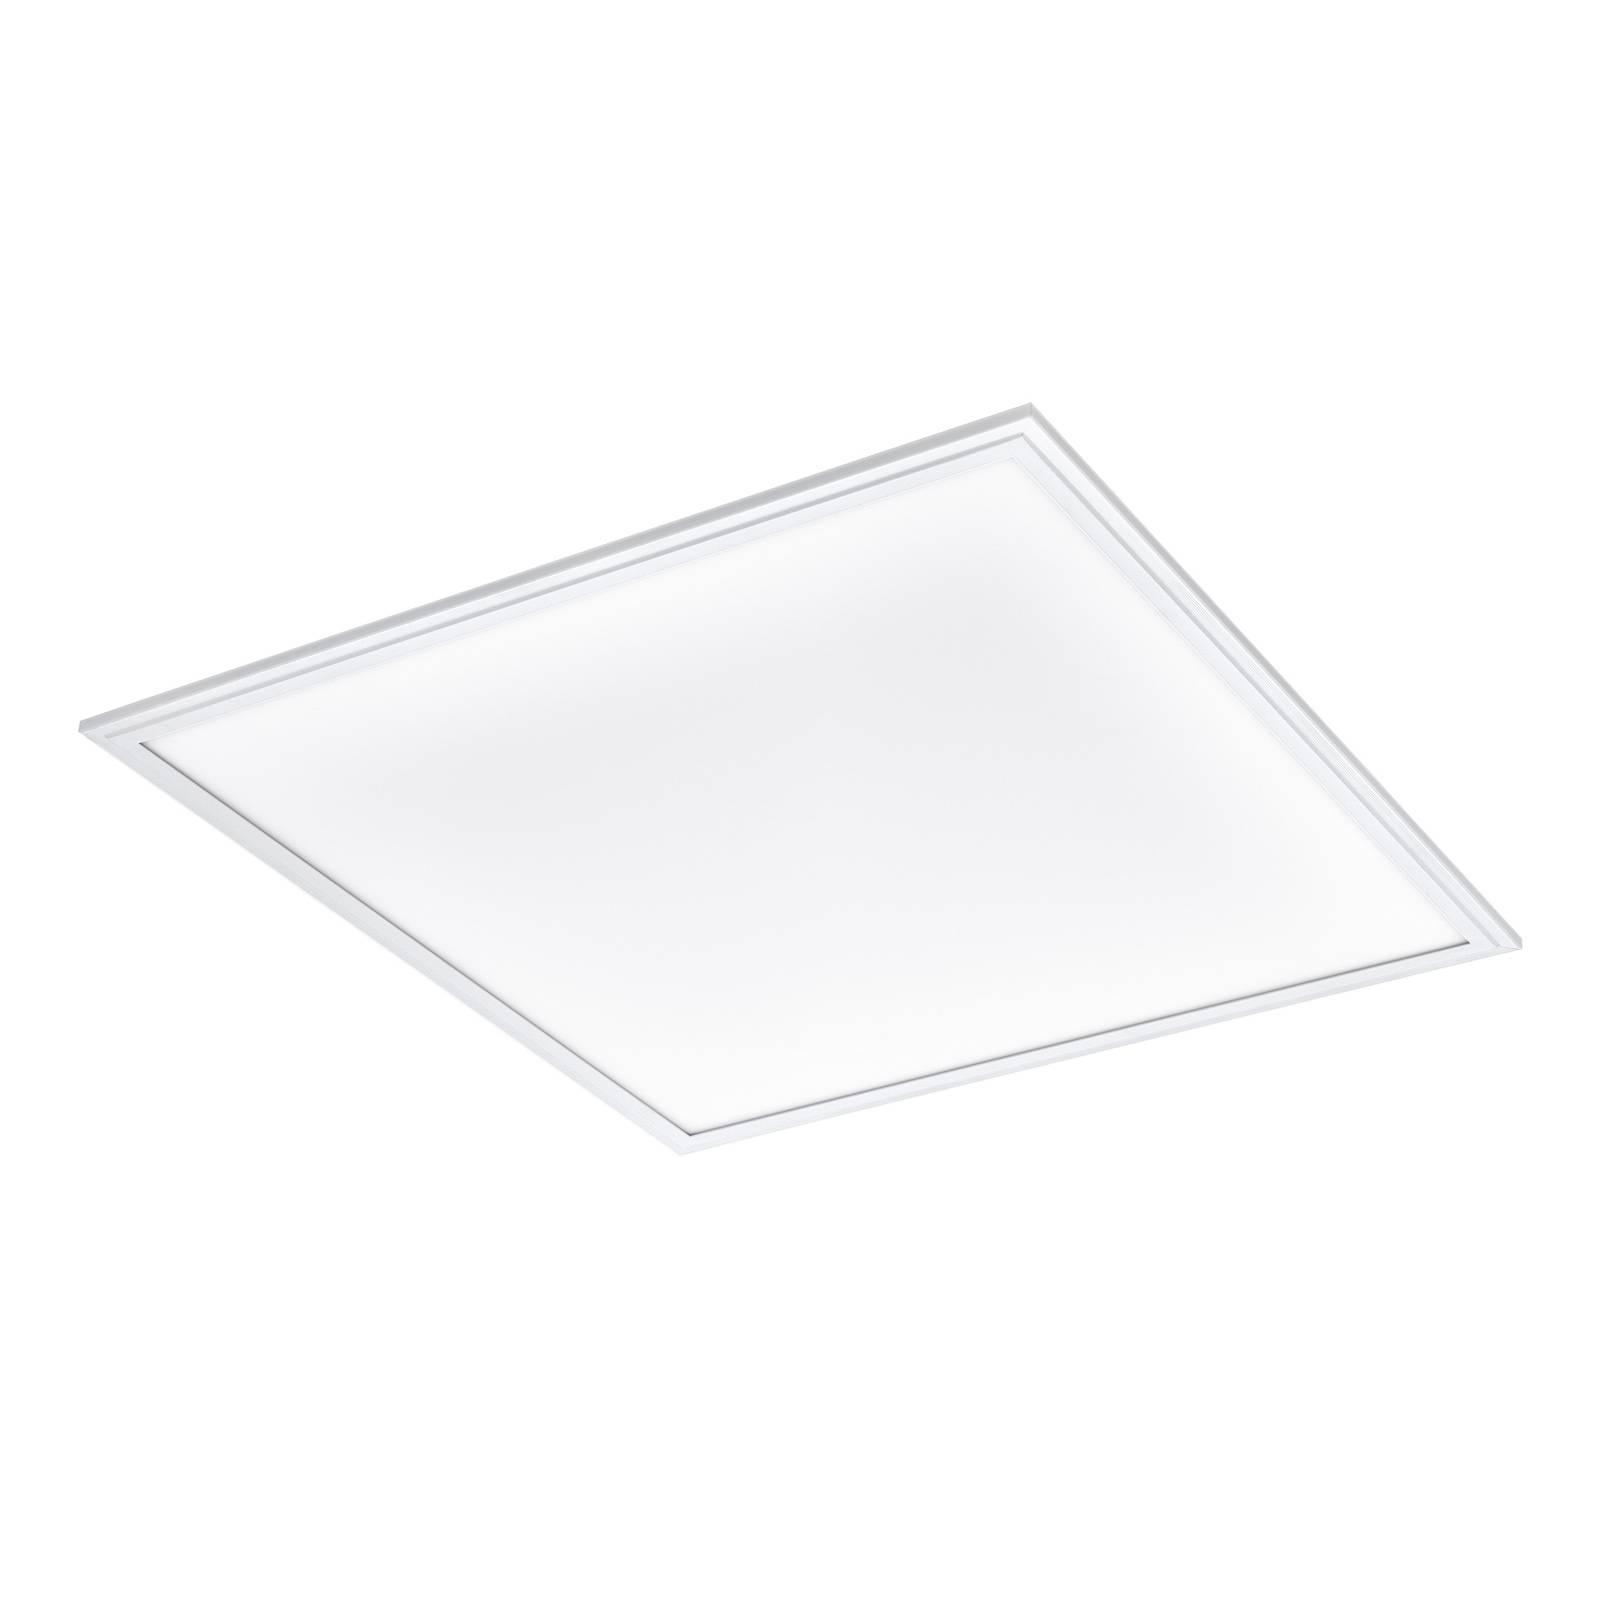 LED plafondlamp Salobrena-M 59,5x59,5 cm sensor